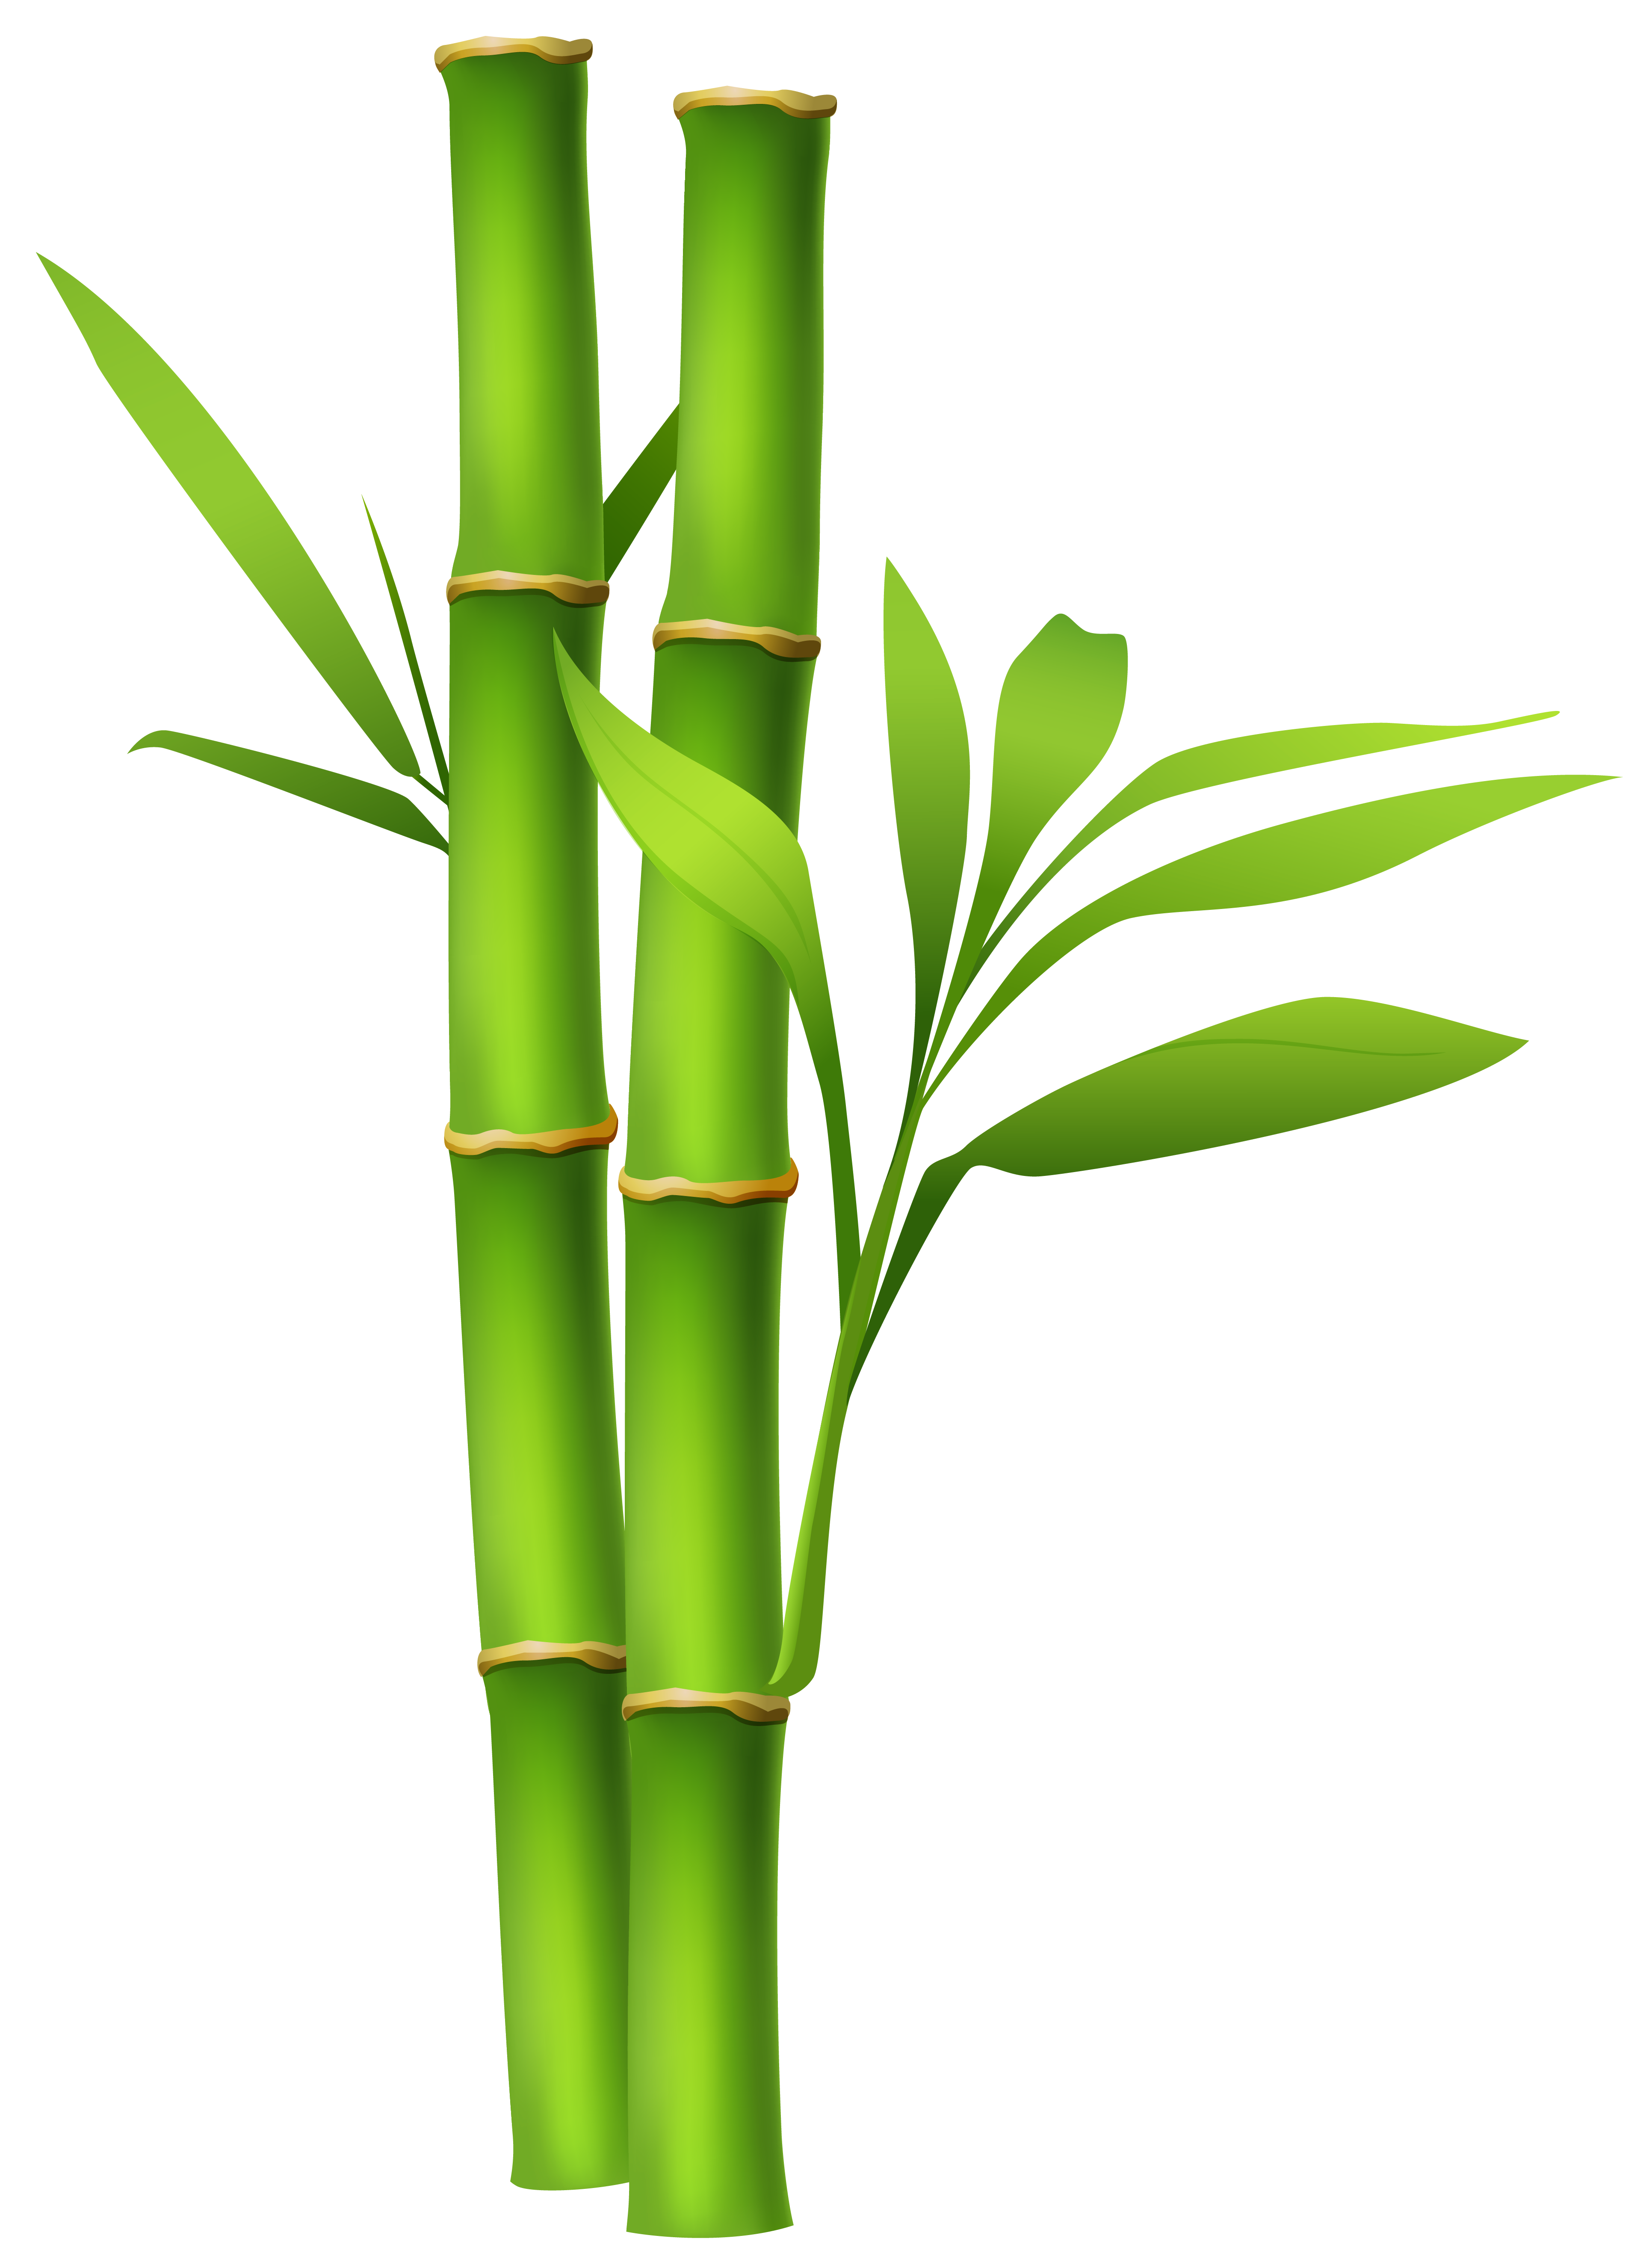 ... Bamboo Clipart - clipartall ...-... Bamboo Clipart - clipartall ...-7